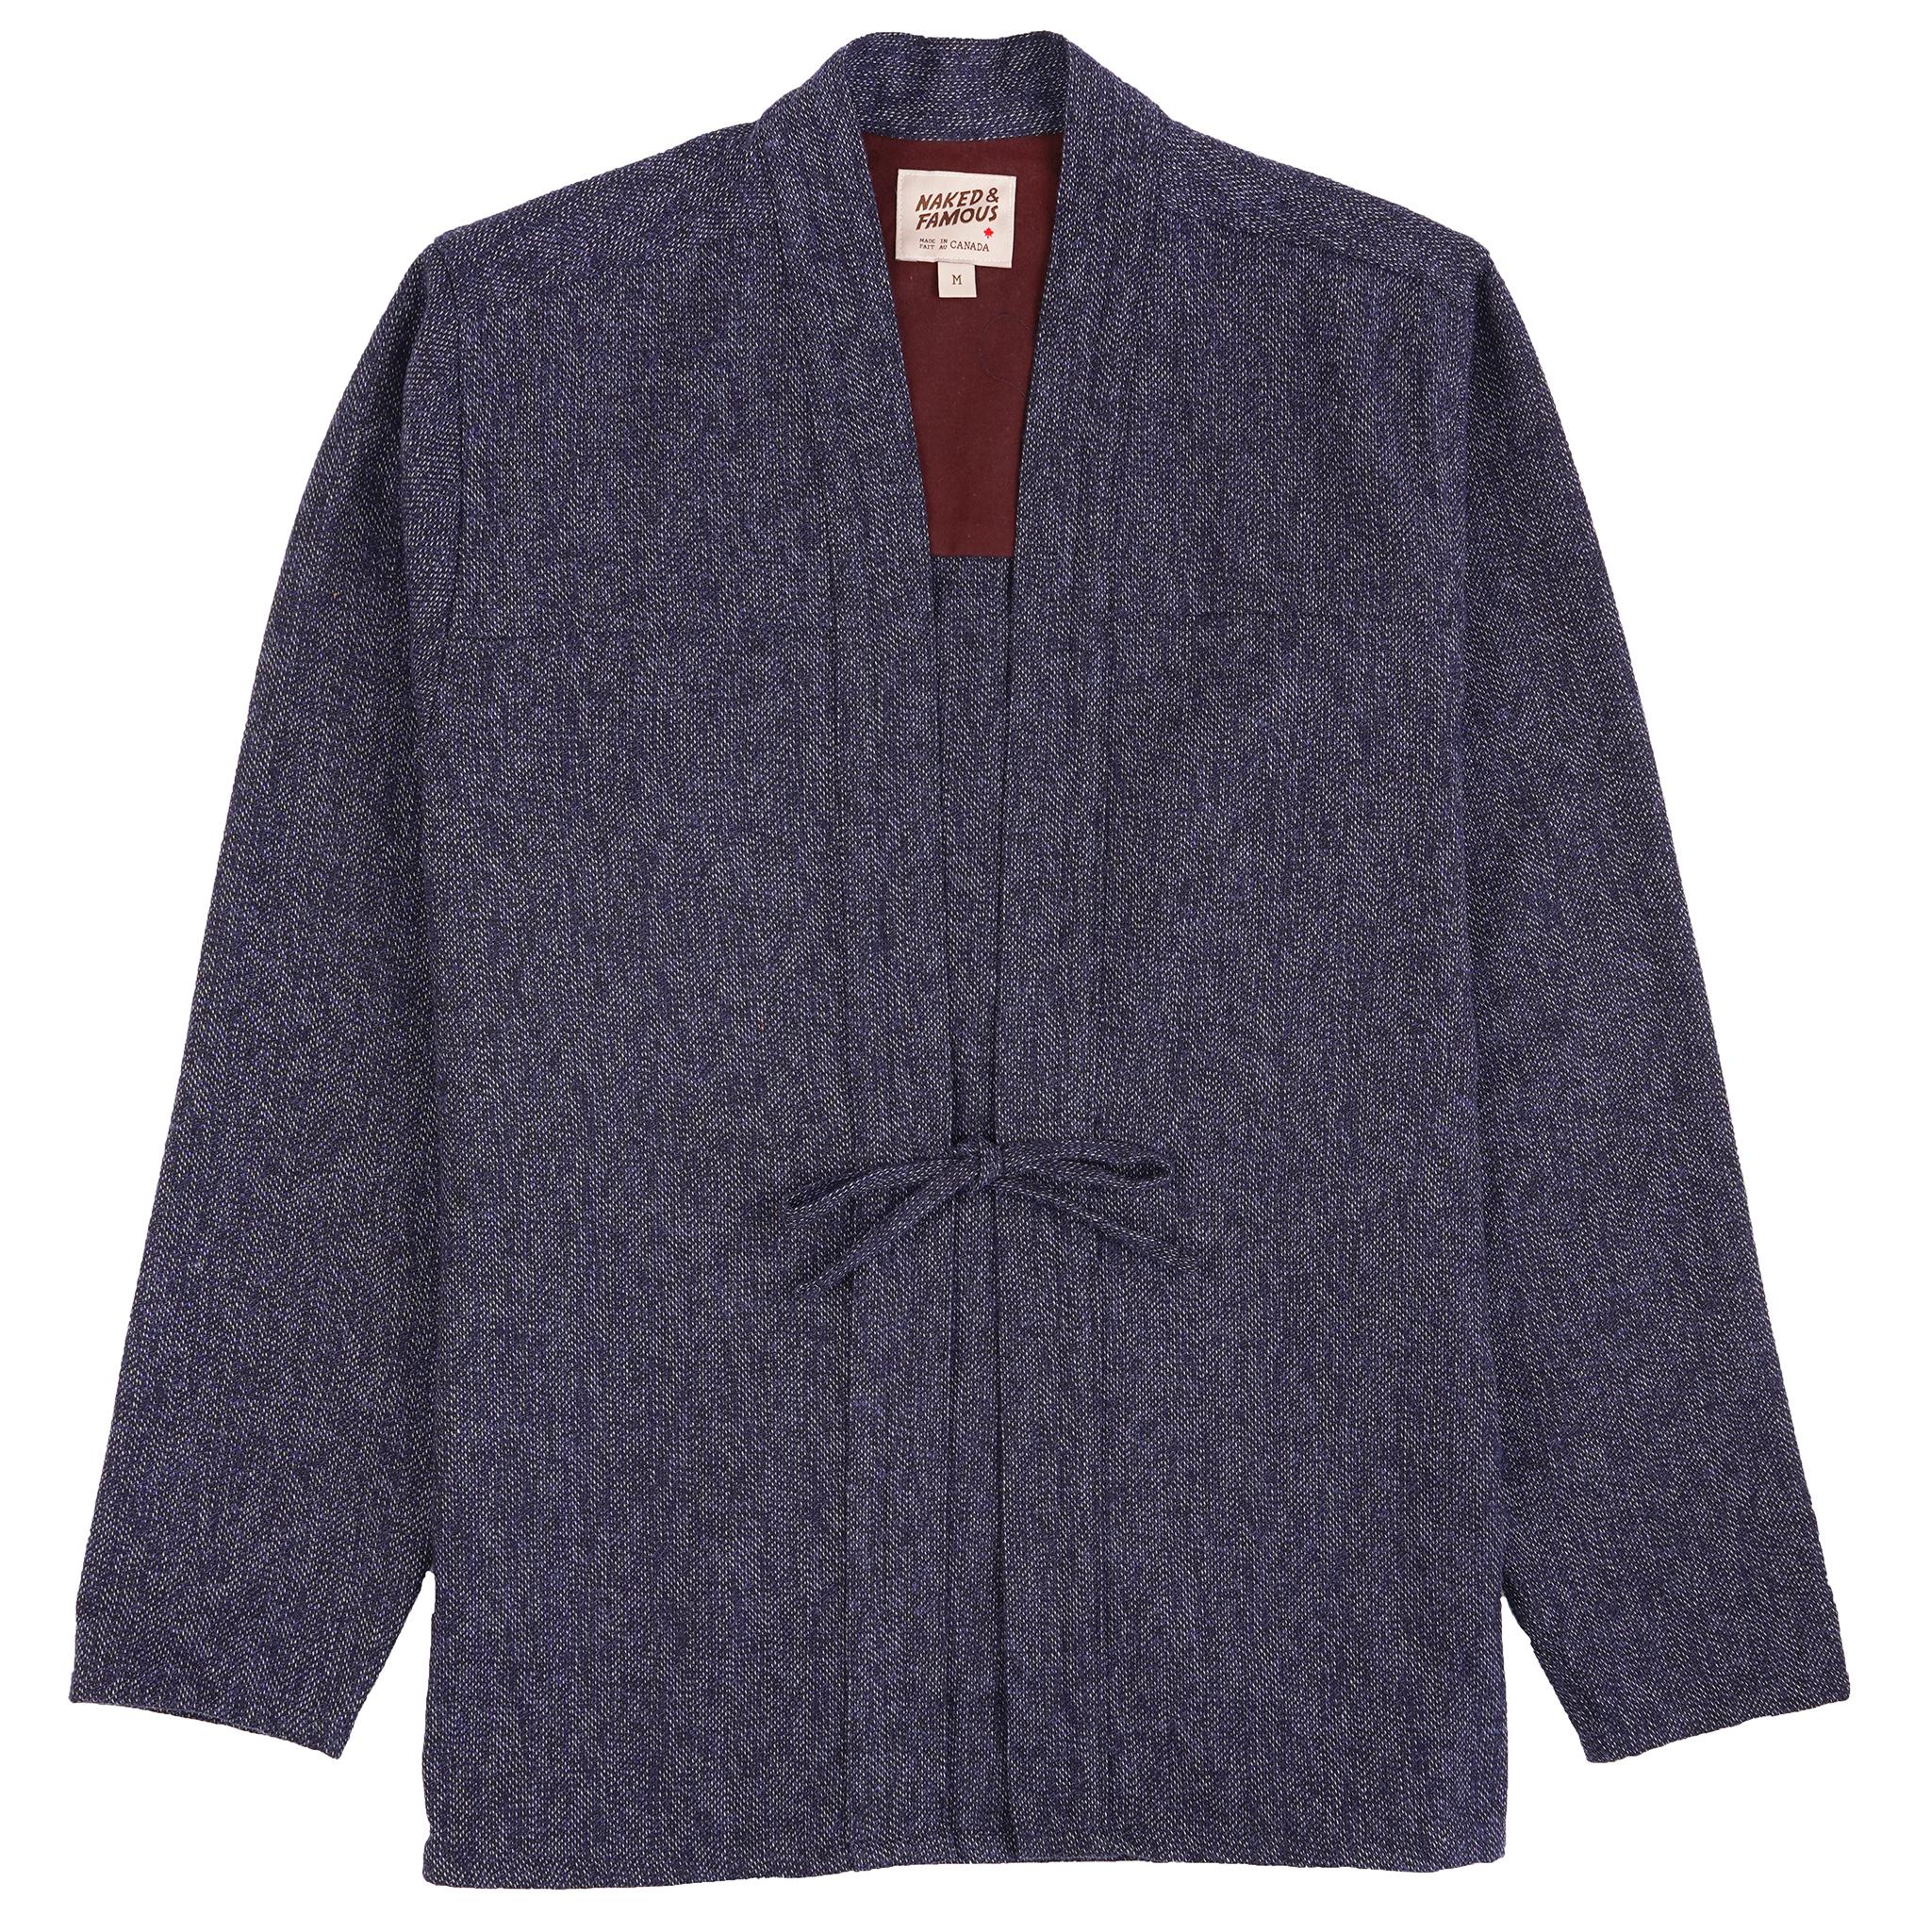 Cotton Tweed - Blue - Kimono Shirt